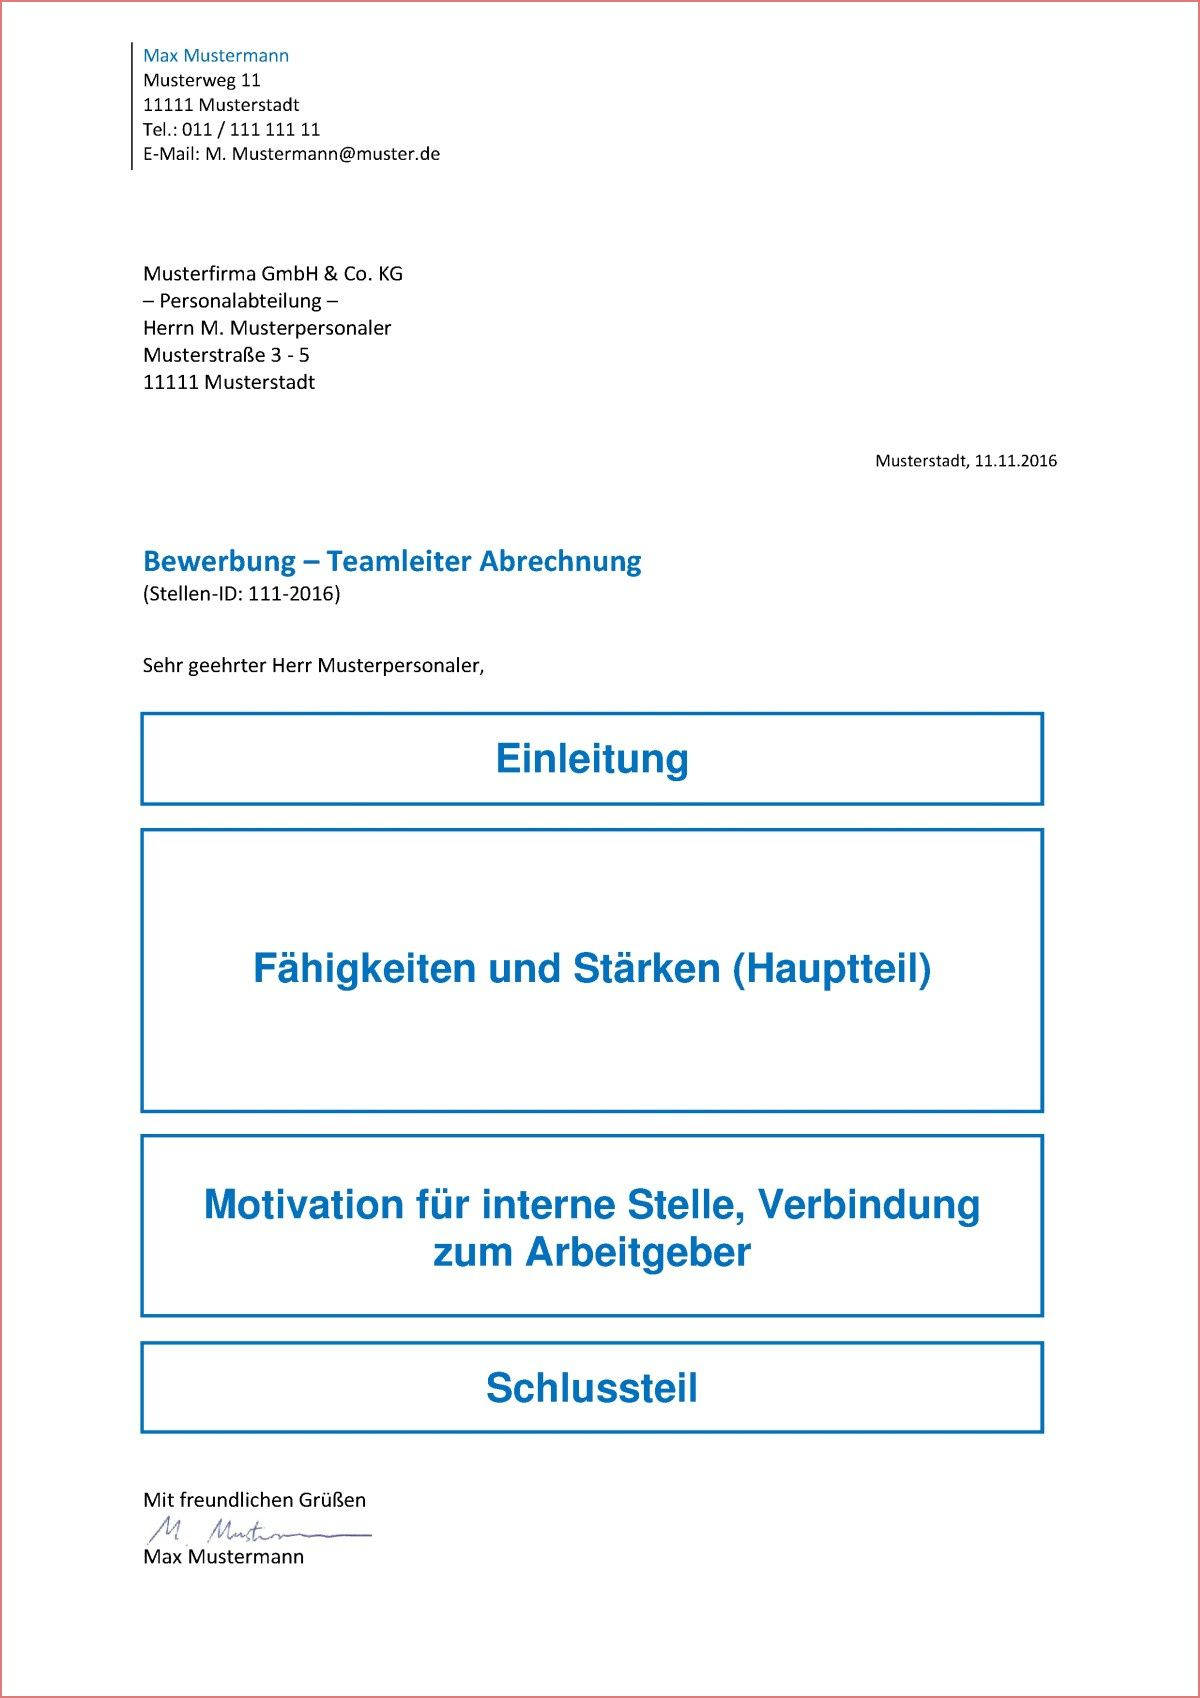 19 Positiv Interne Bewerbung Lebenslauf Stock In 2020 Funny Christmas Cards Christmas Humor Christmas Photo Cards